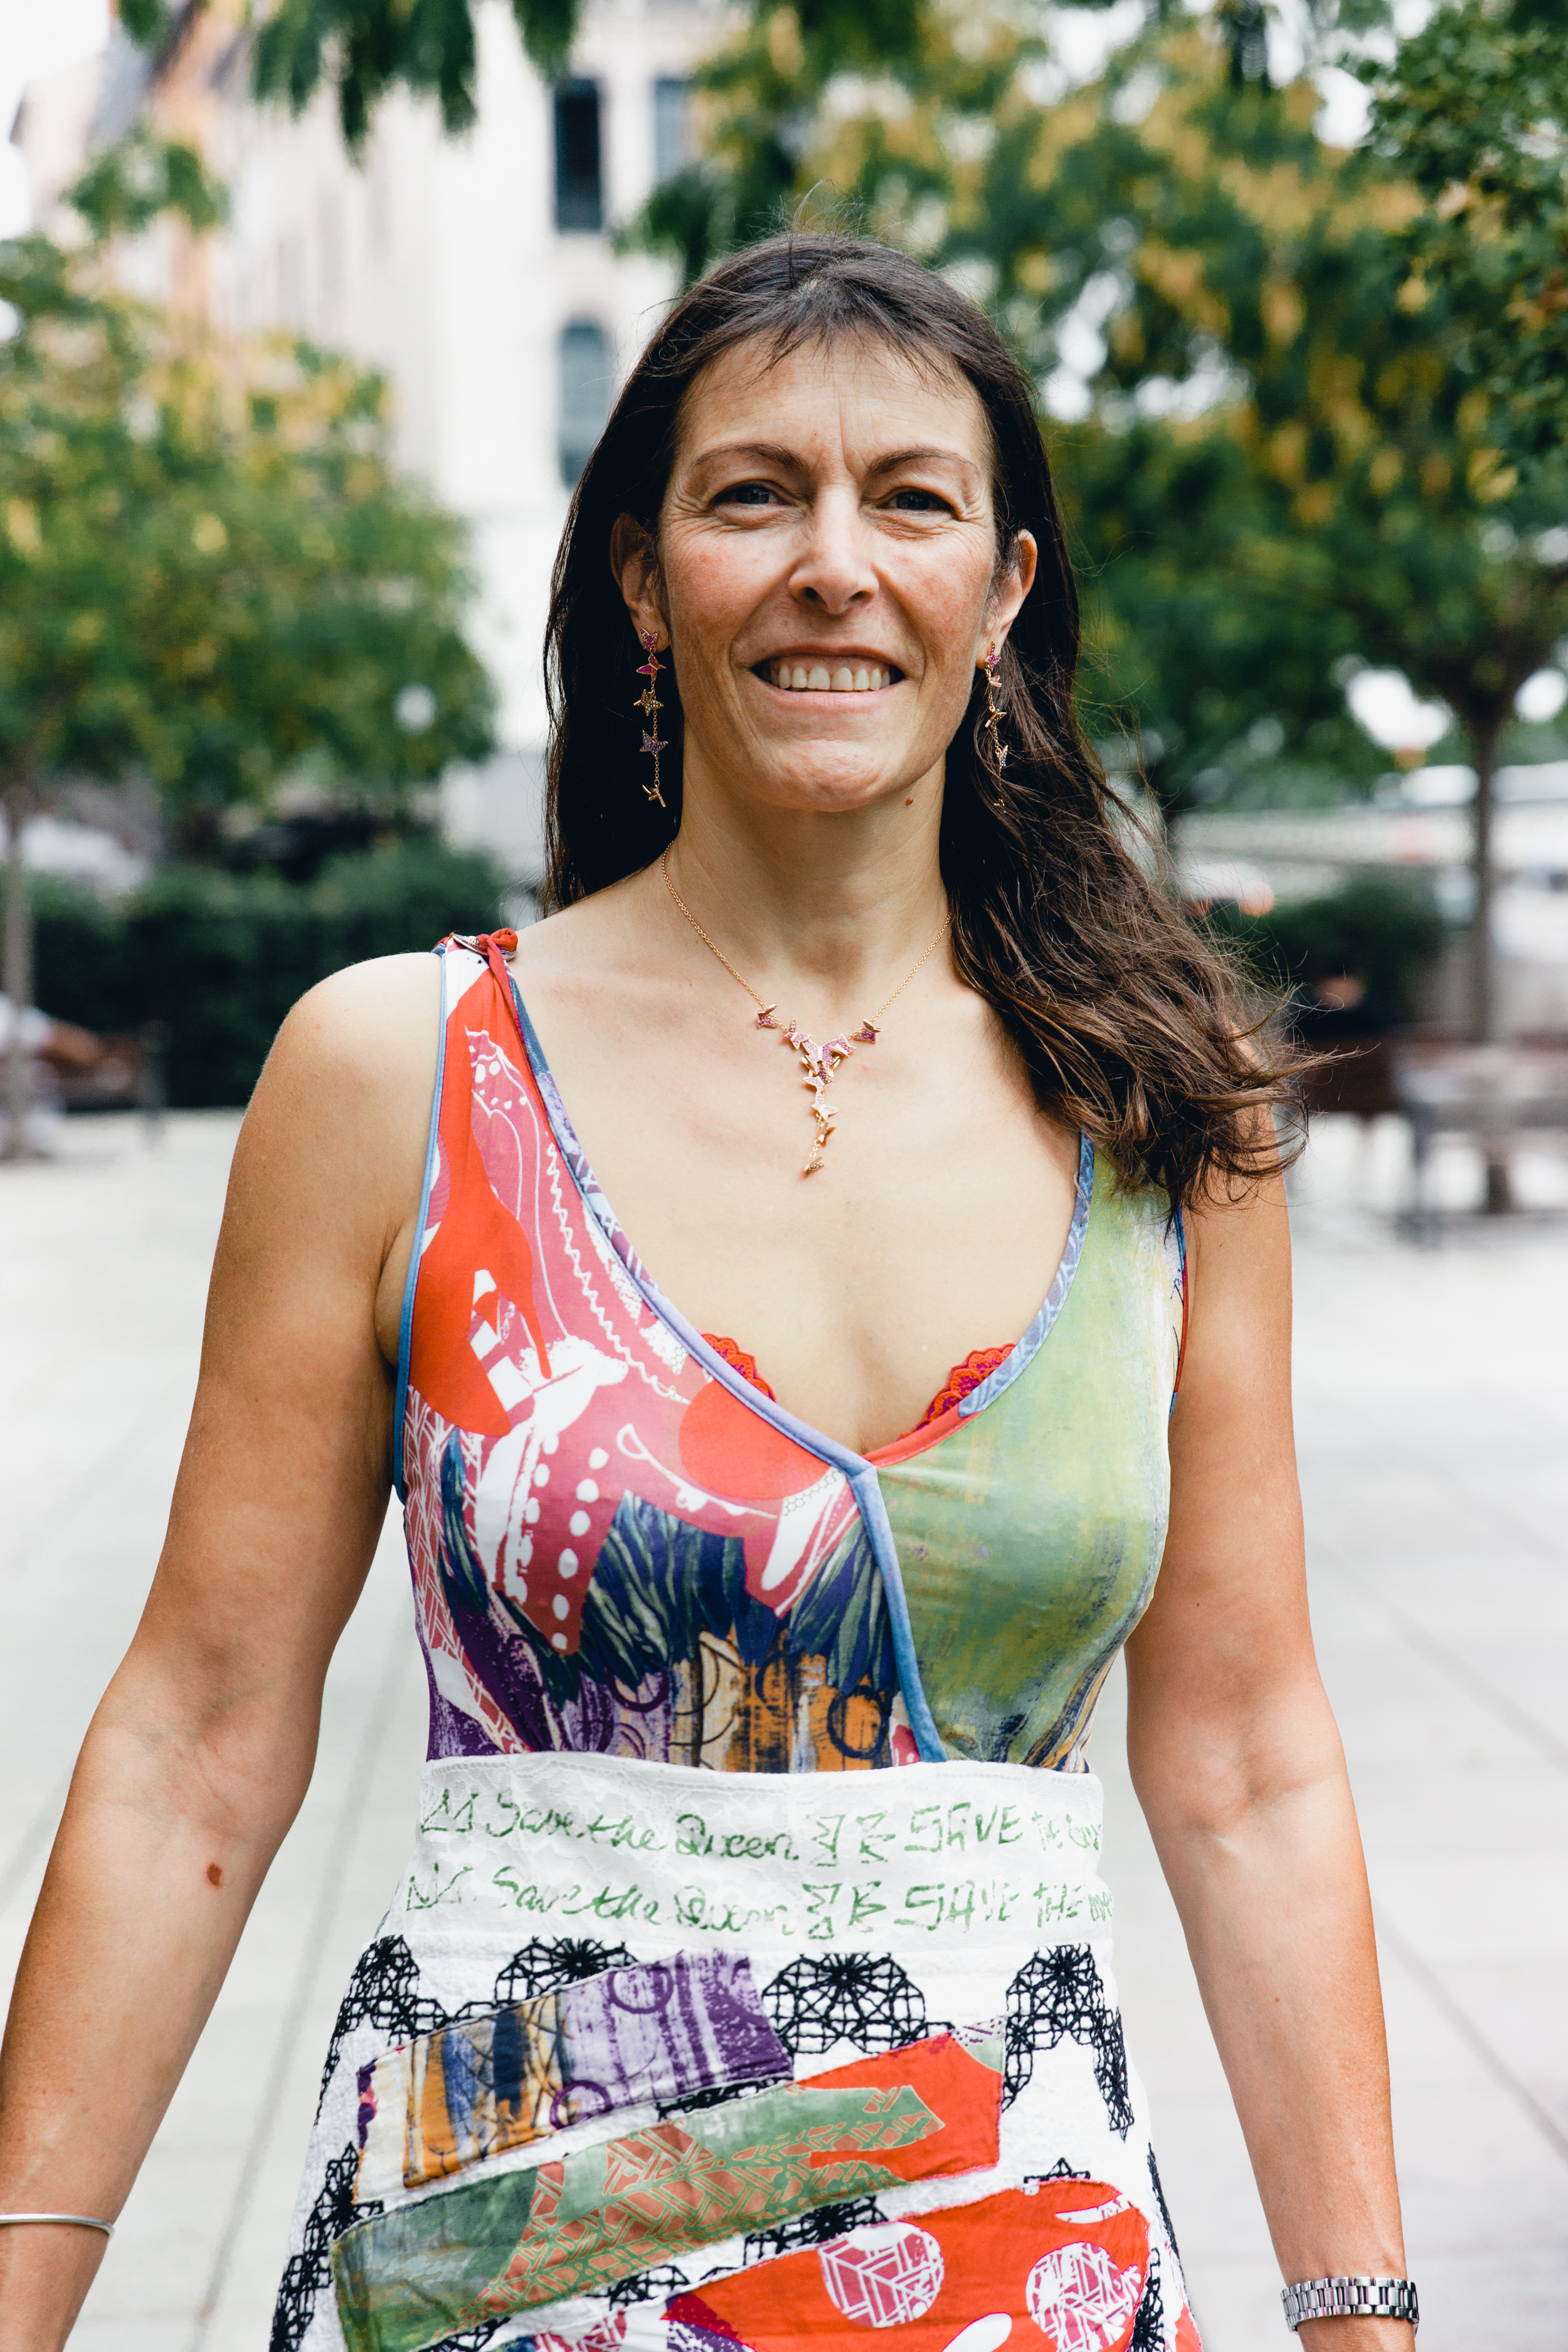 Florence Andrivon, thérapeute en sophro-analyse et reiki, à Bron (Lyon)